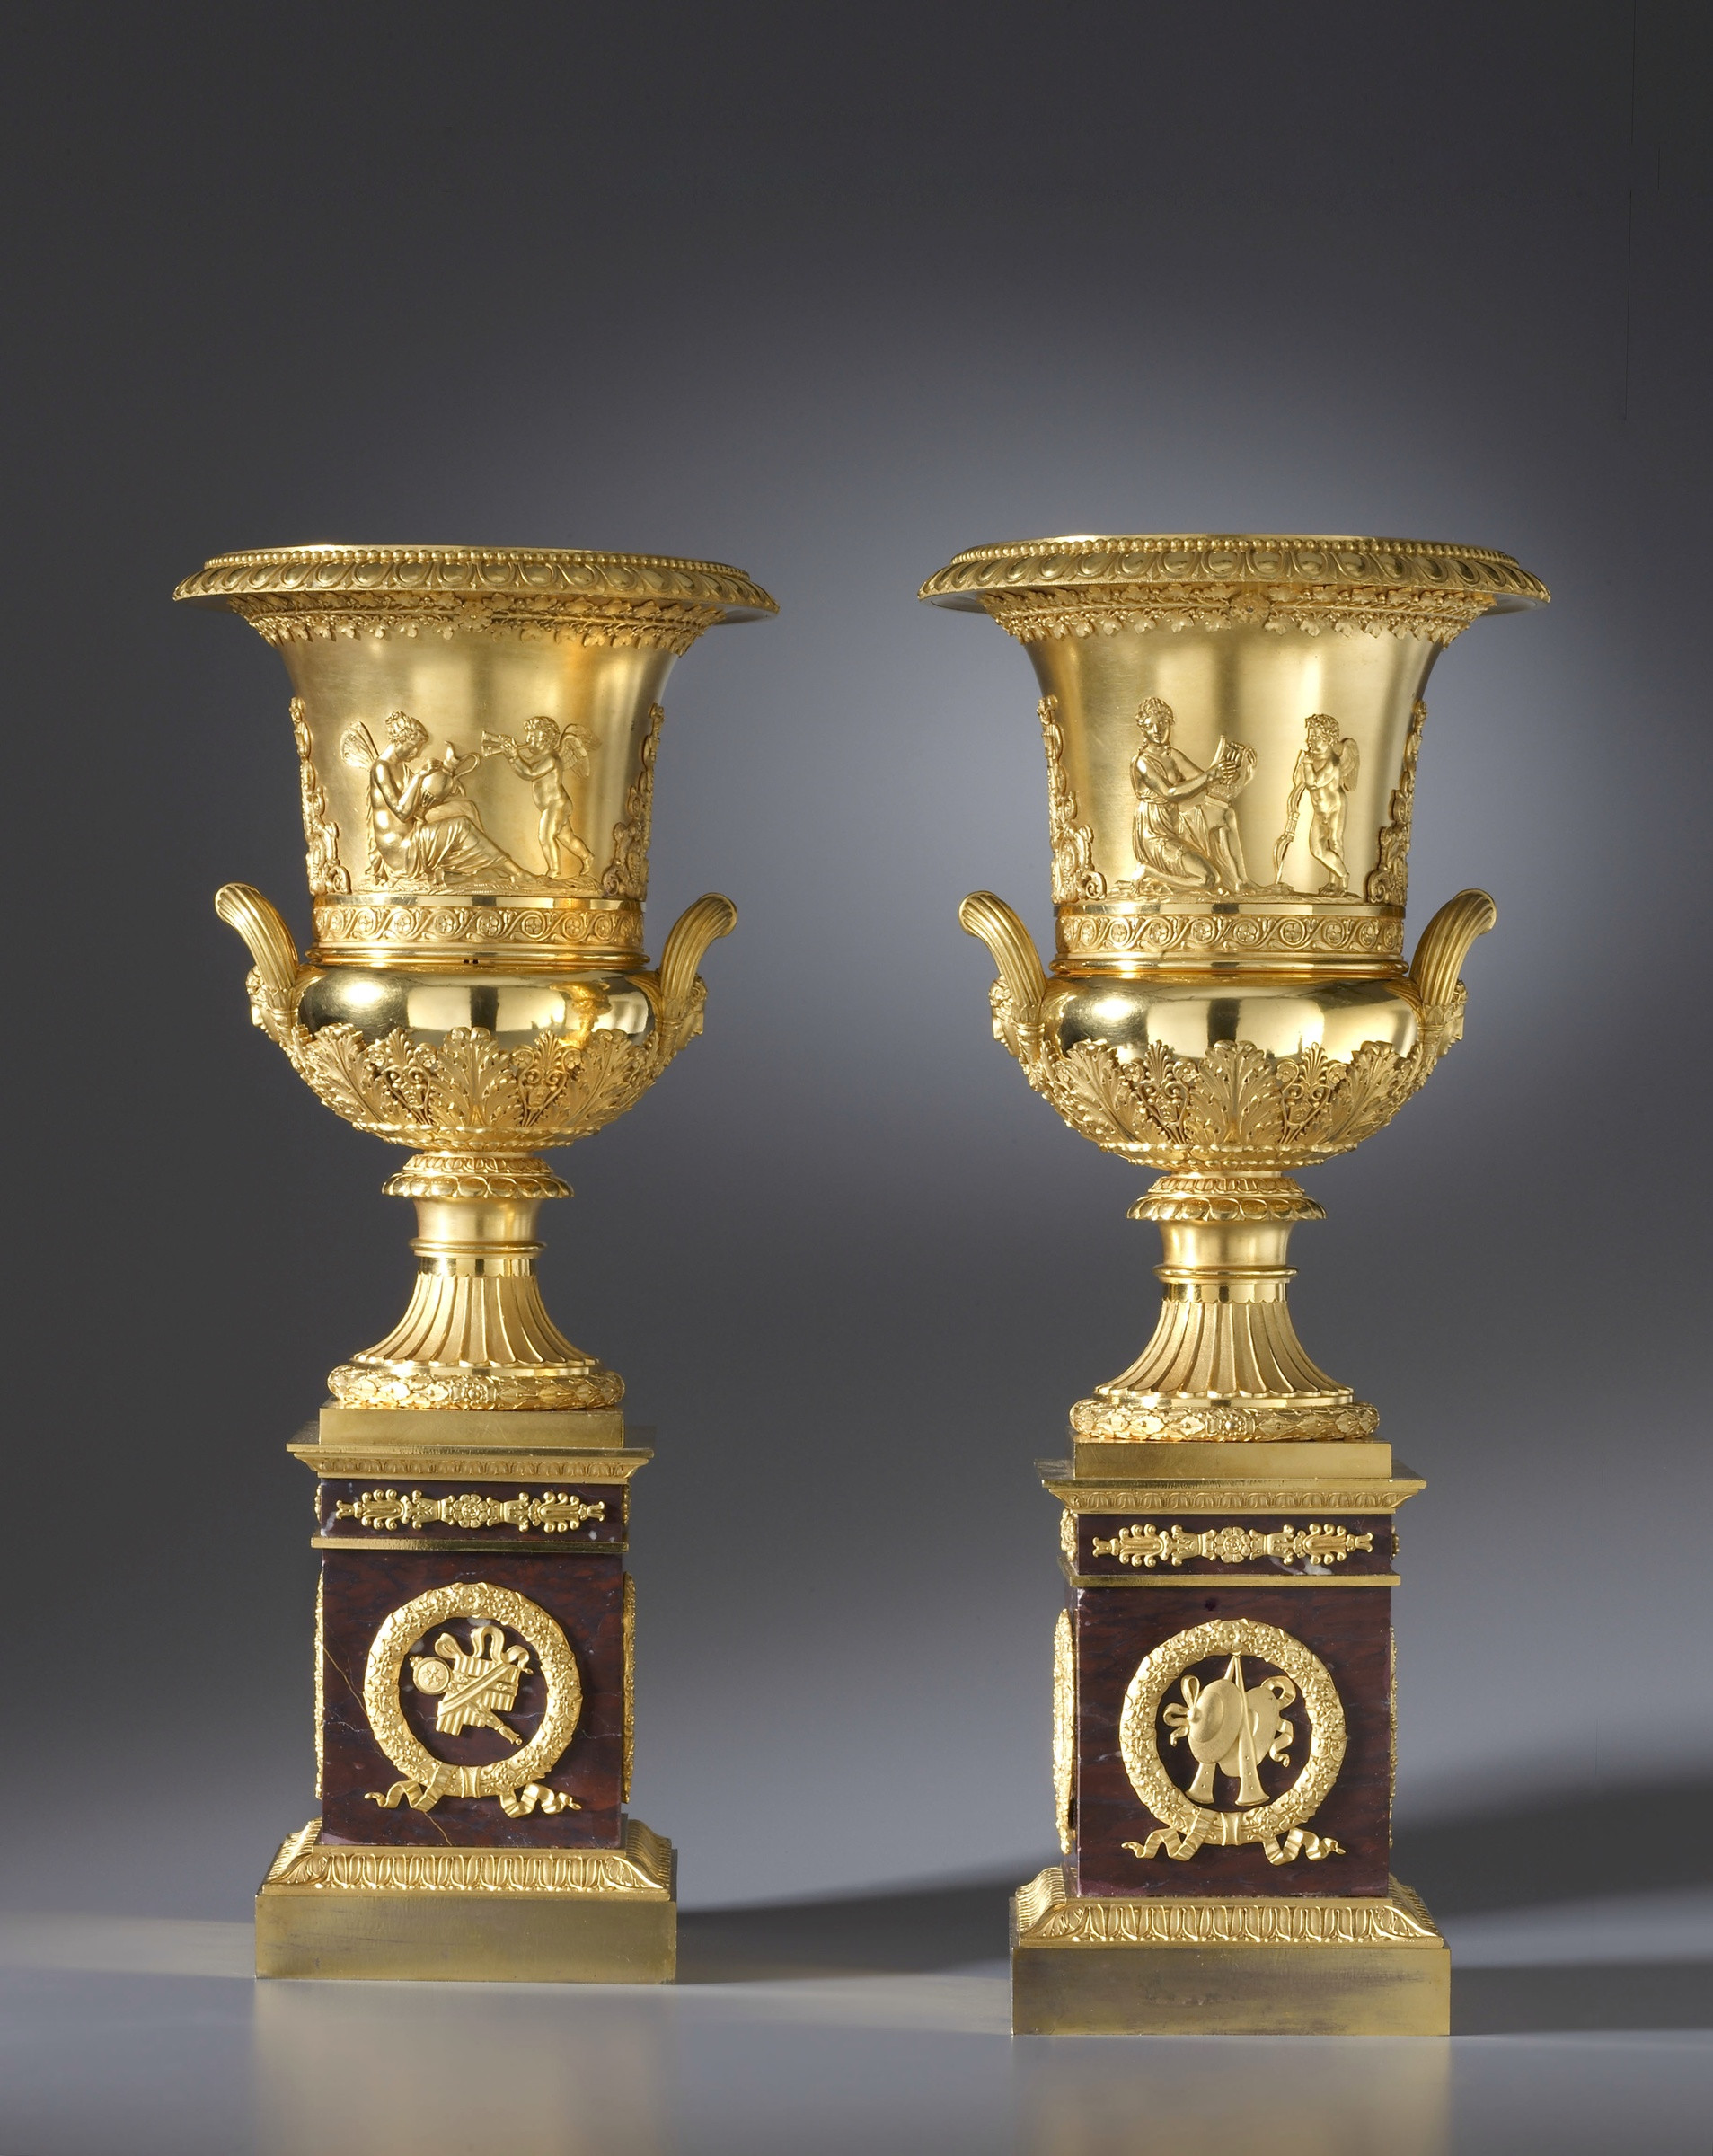 26 Great Antique Bronze Vase 2021 free download antique bronze vase of pierre philippe thomire a pair of empire vases by pierre philippe regarding a pair of empire vases by pierre philippe thomire